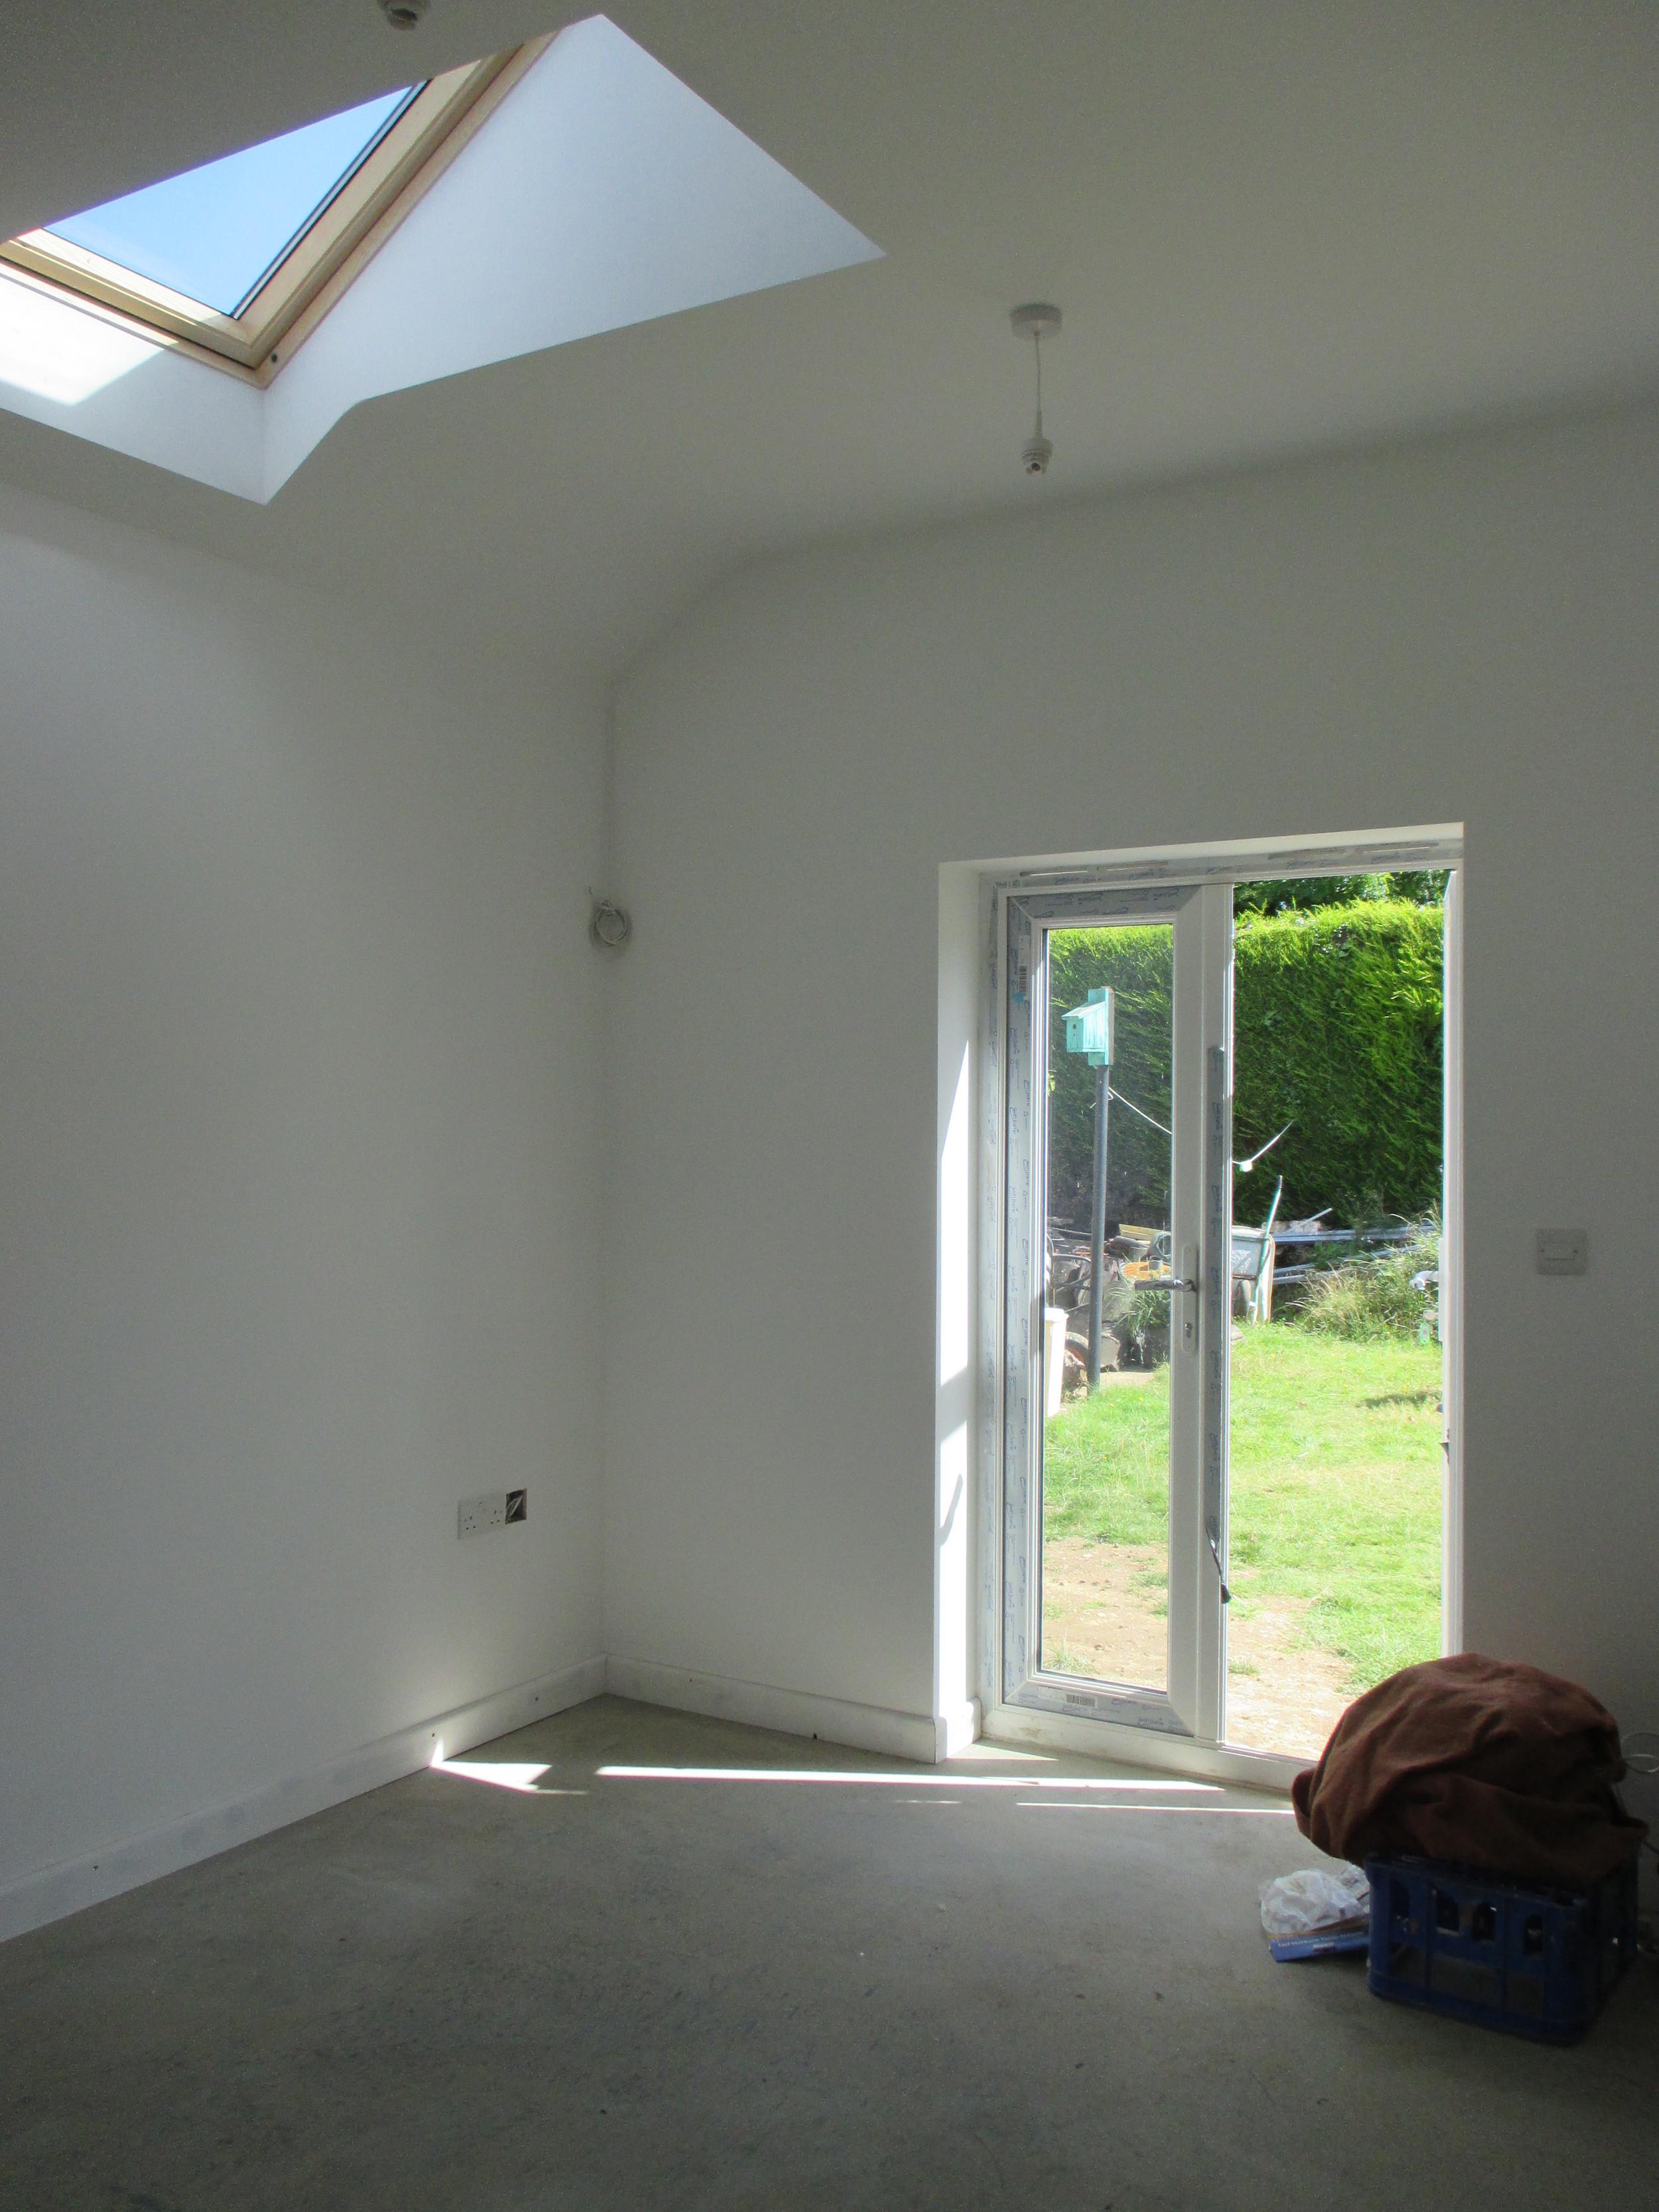 Conversion in Progress - New Rear Bedroom / Study